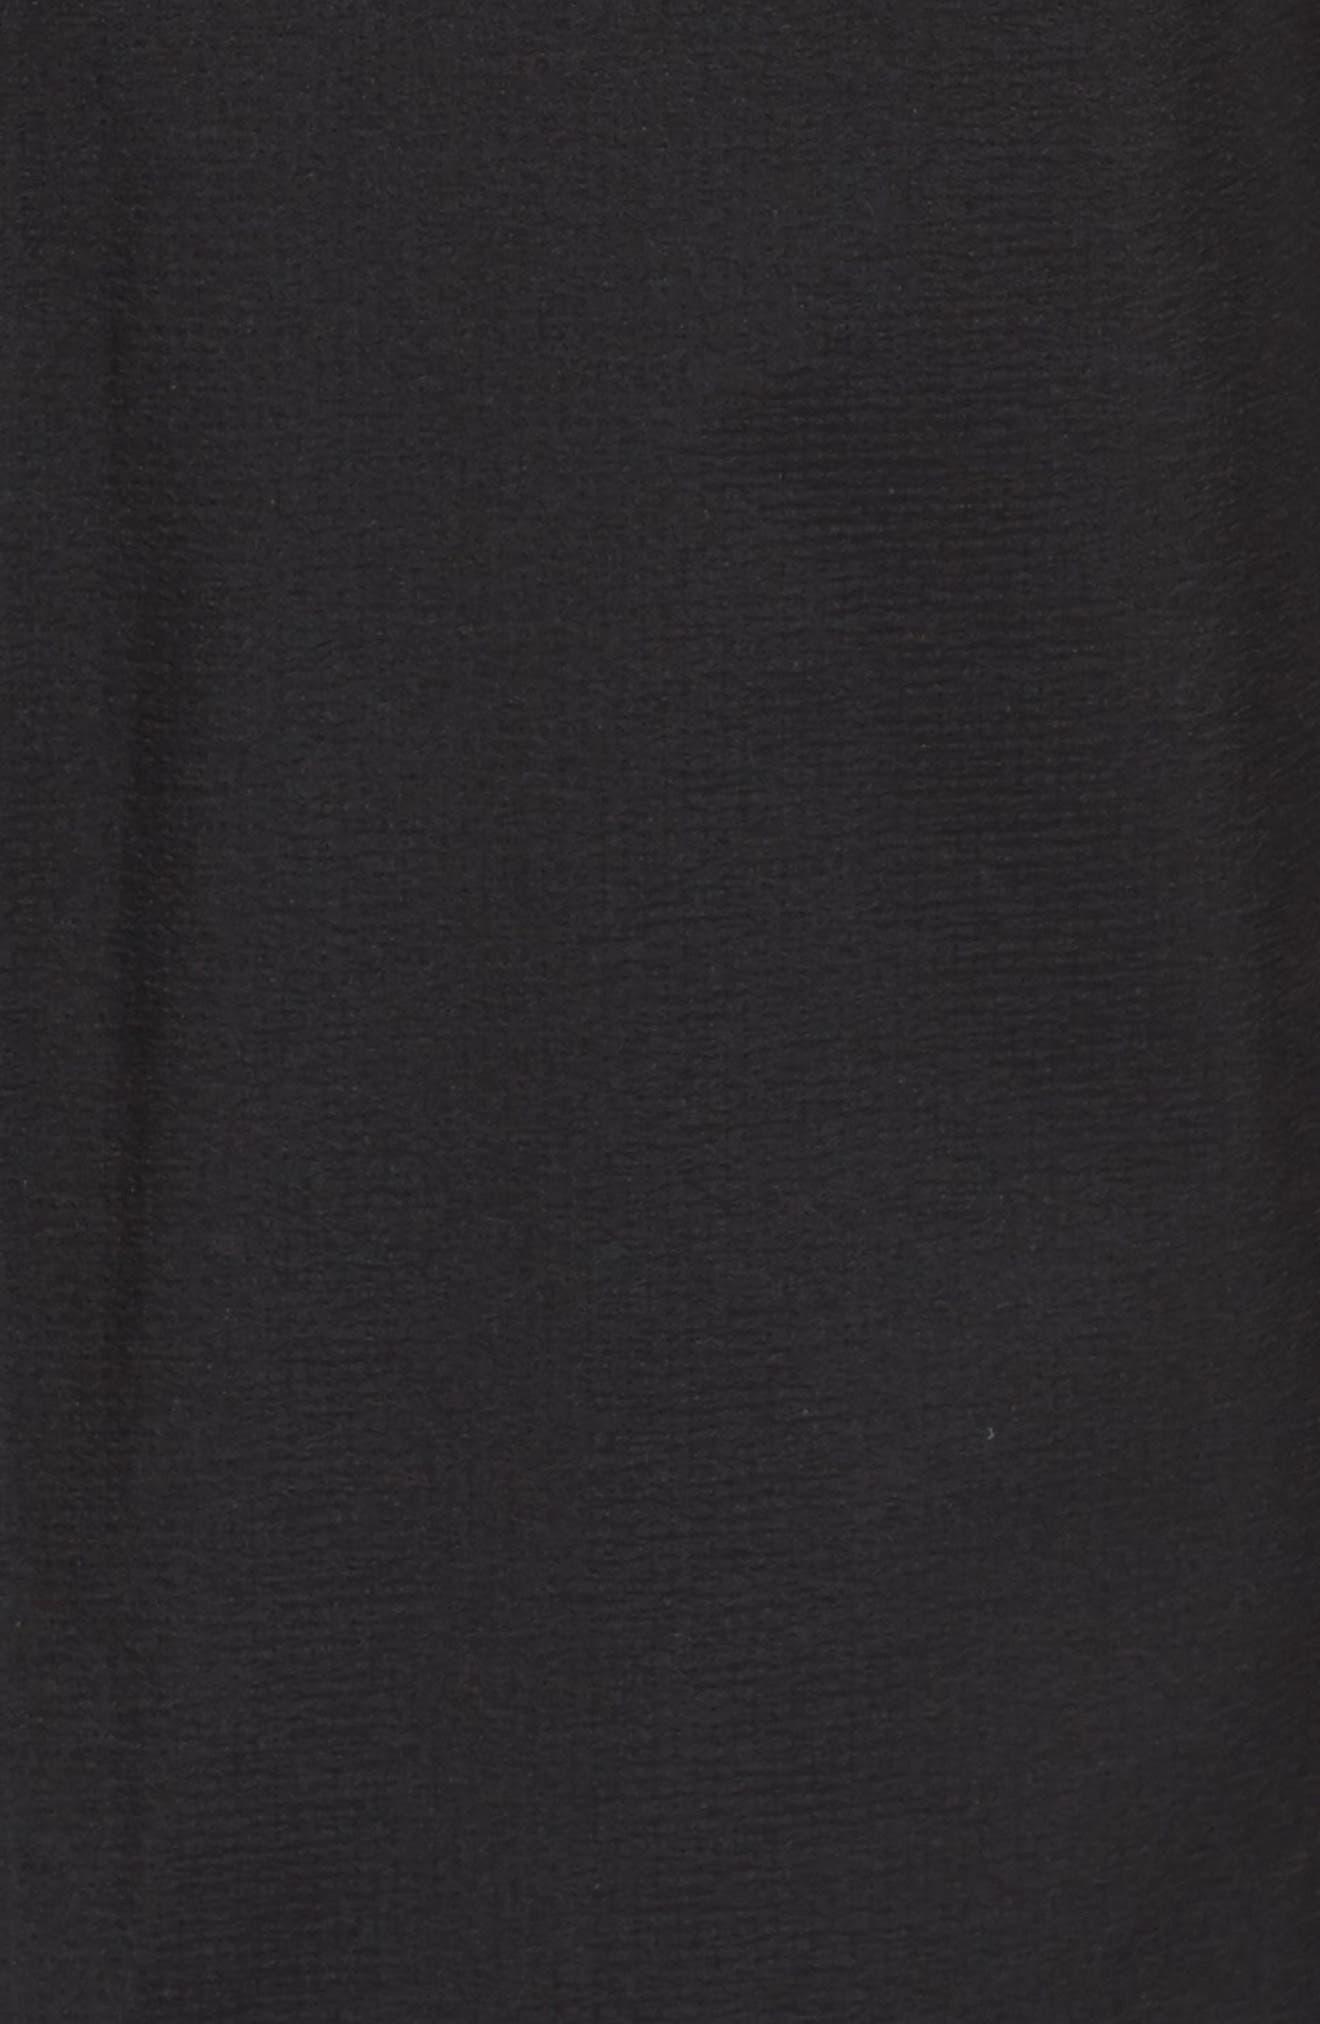 Storm Racer Jacket,                             Alternate thumbnail 5, color,                             Black